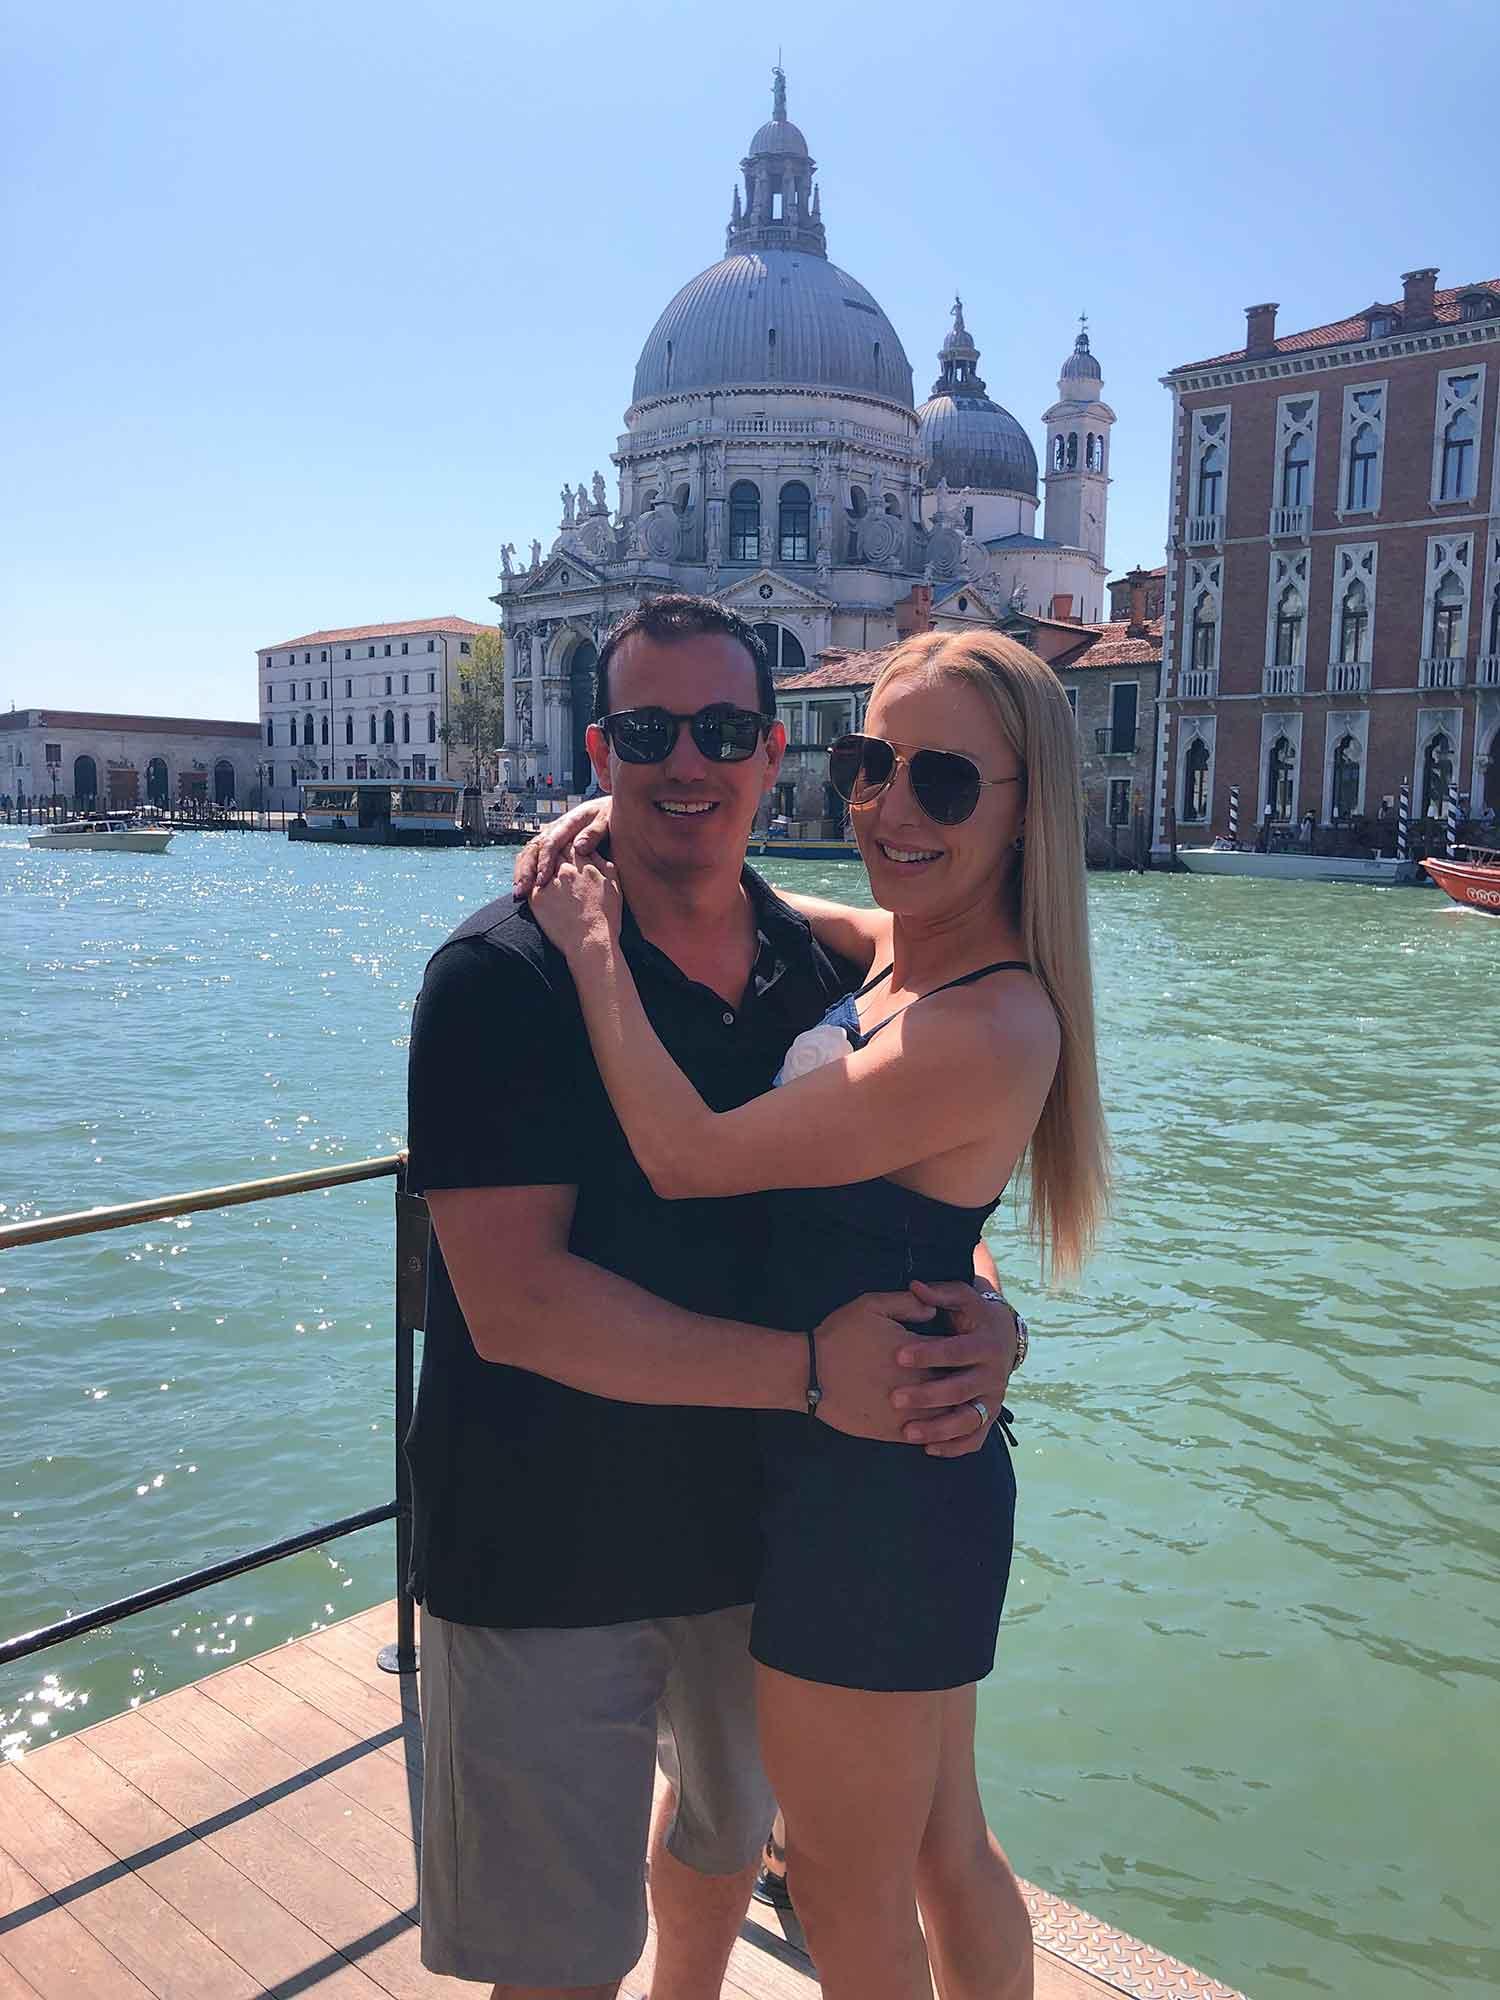 Luxury hotel Venice Gritti Palace Romantic couple 5* Hotel